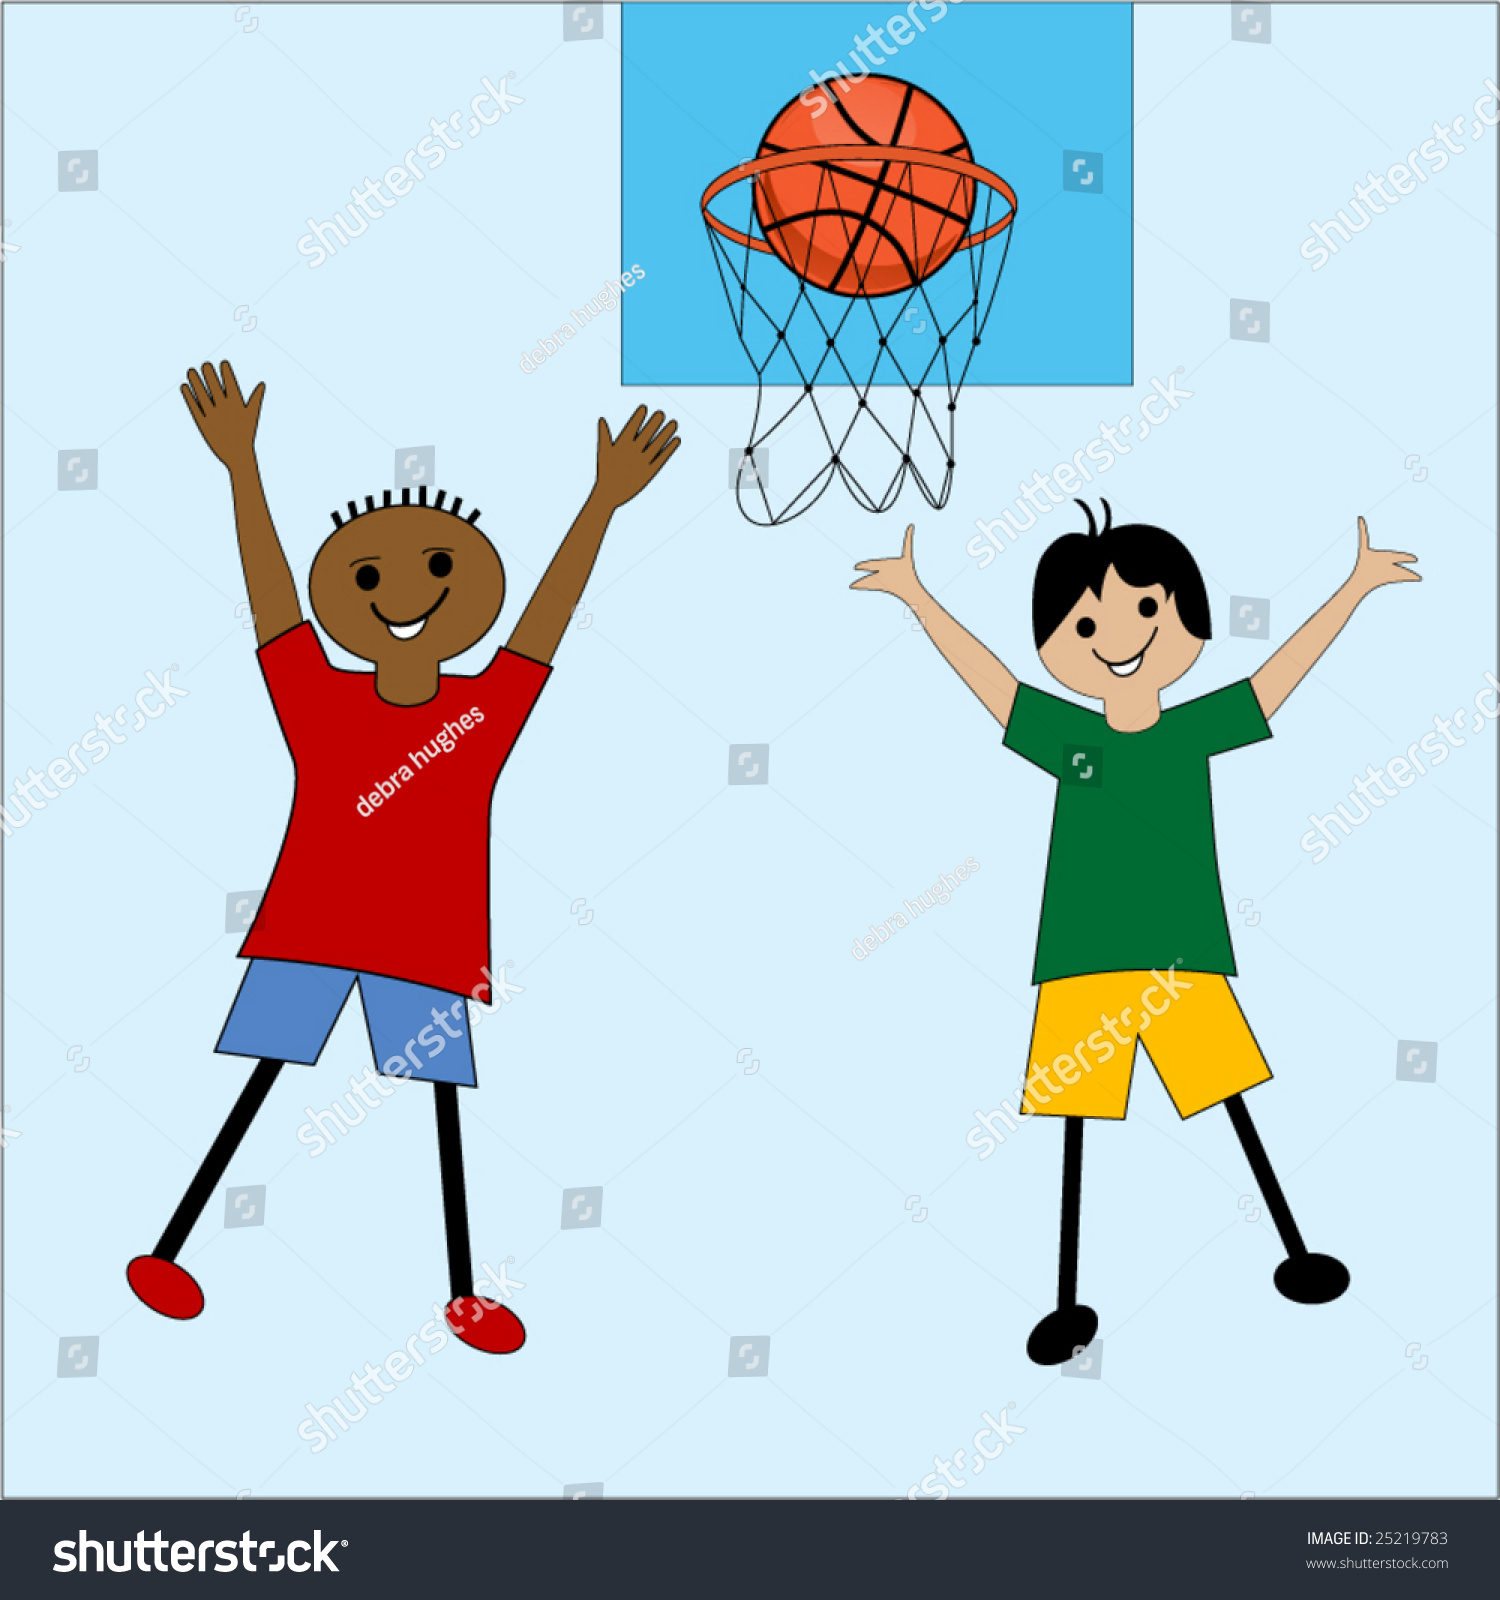 Cartoon Kids Playing Basketball Stock Vector Illustration